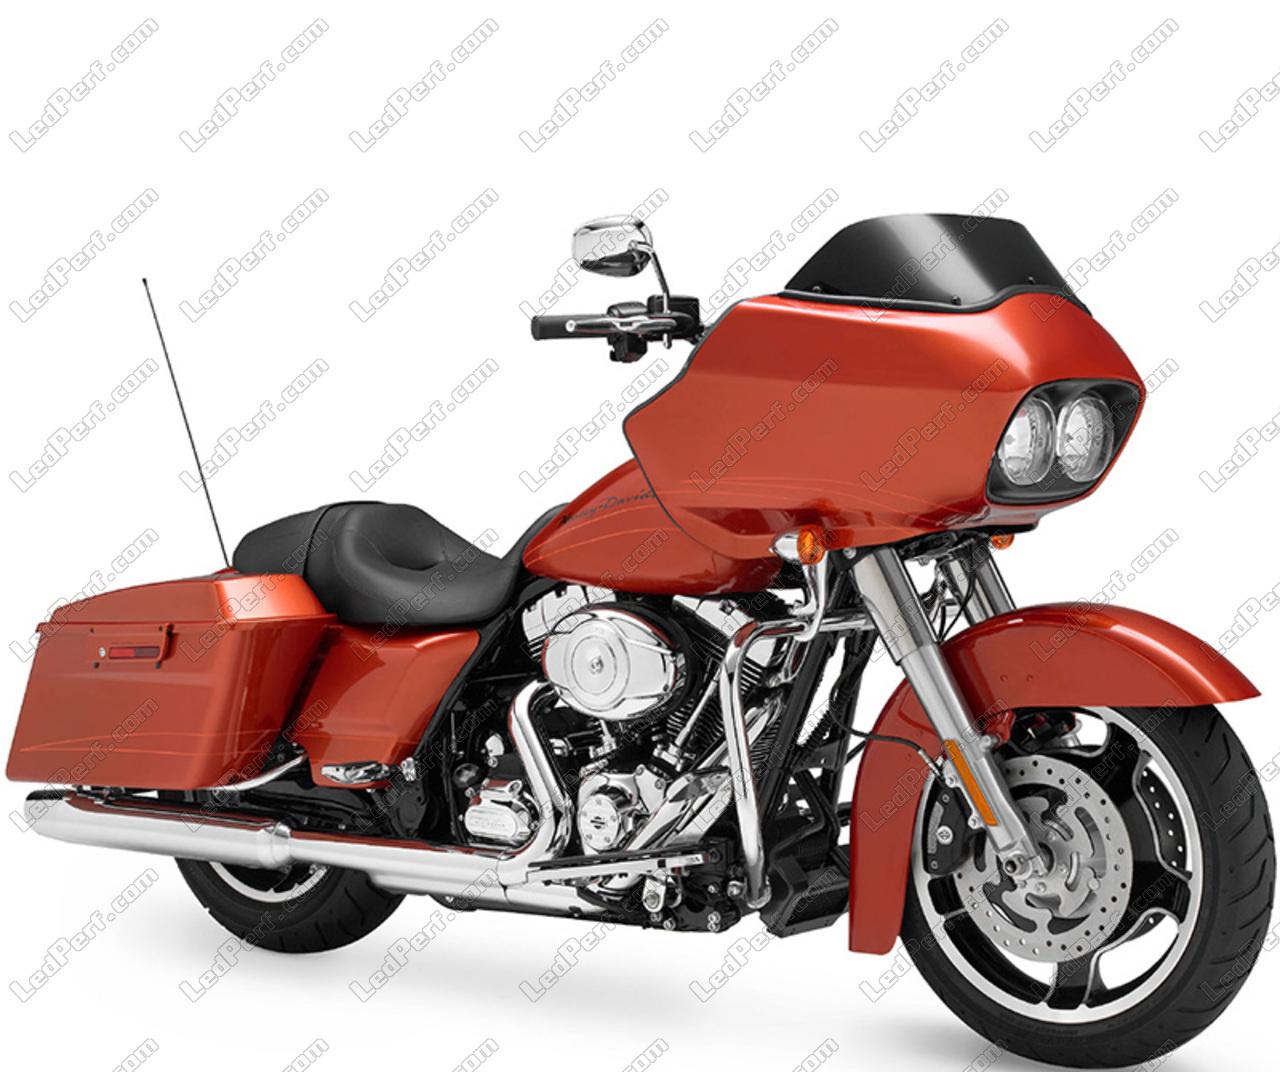 Additional Led Headlights For Motorcycle Harley Davidson Road Glide Custom 1584 1690